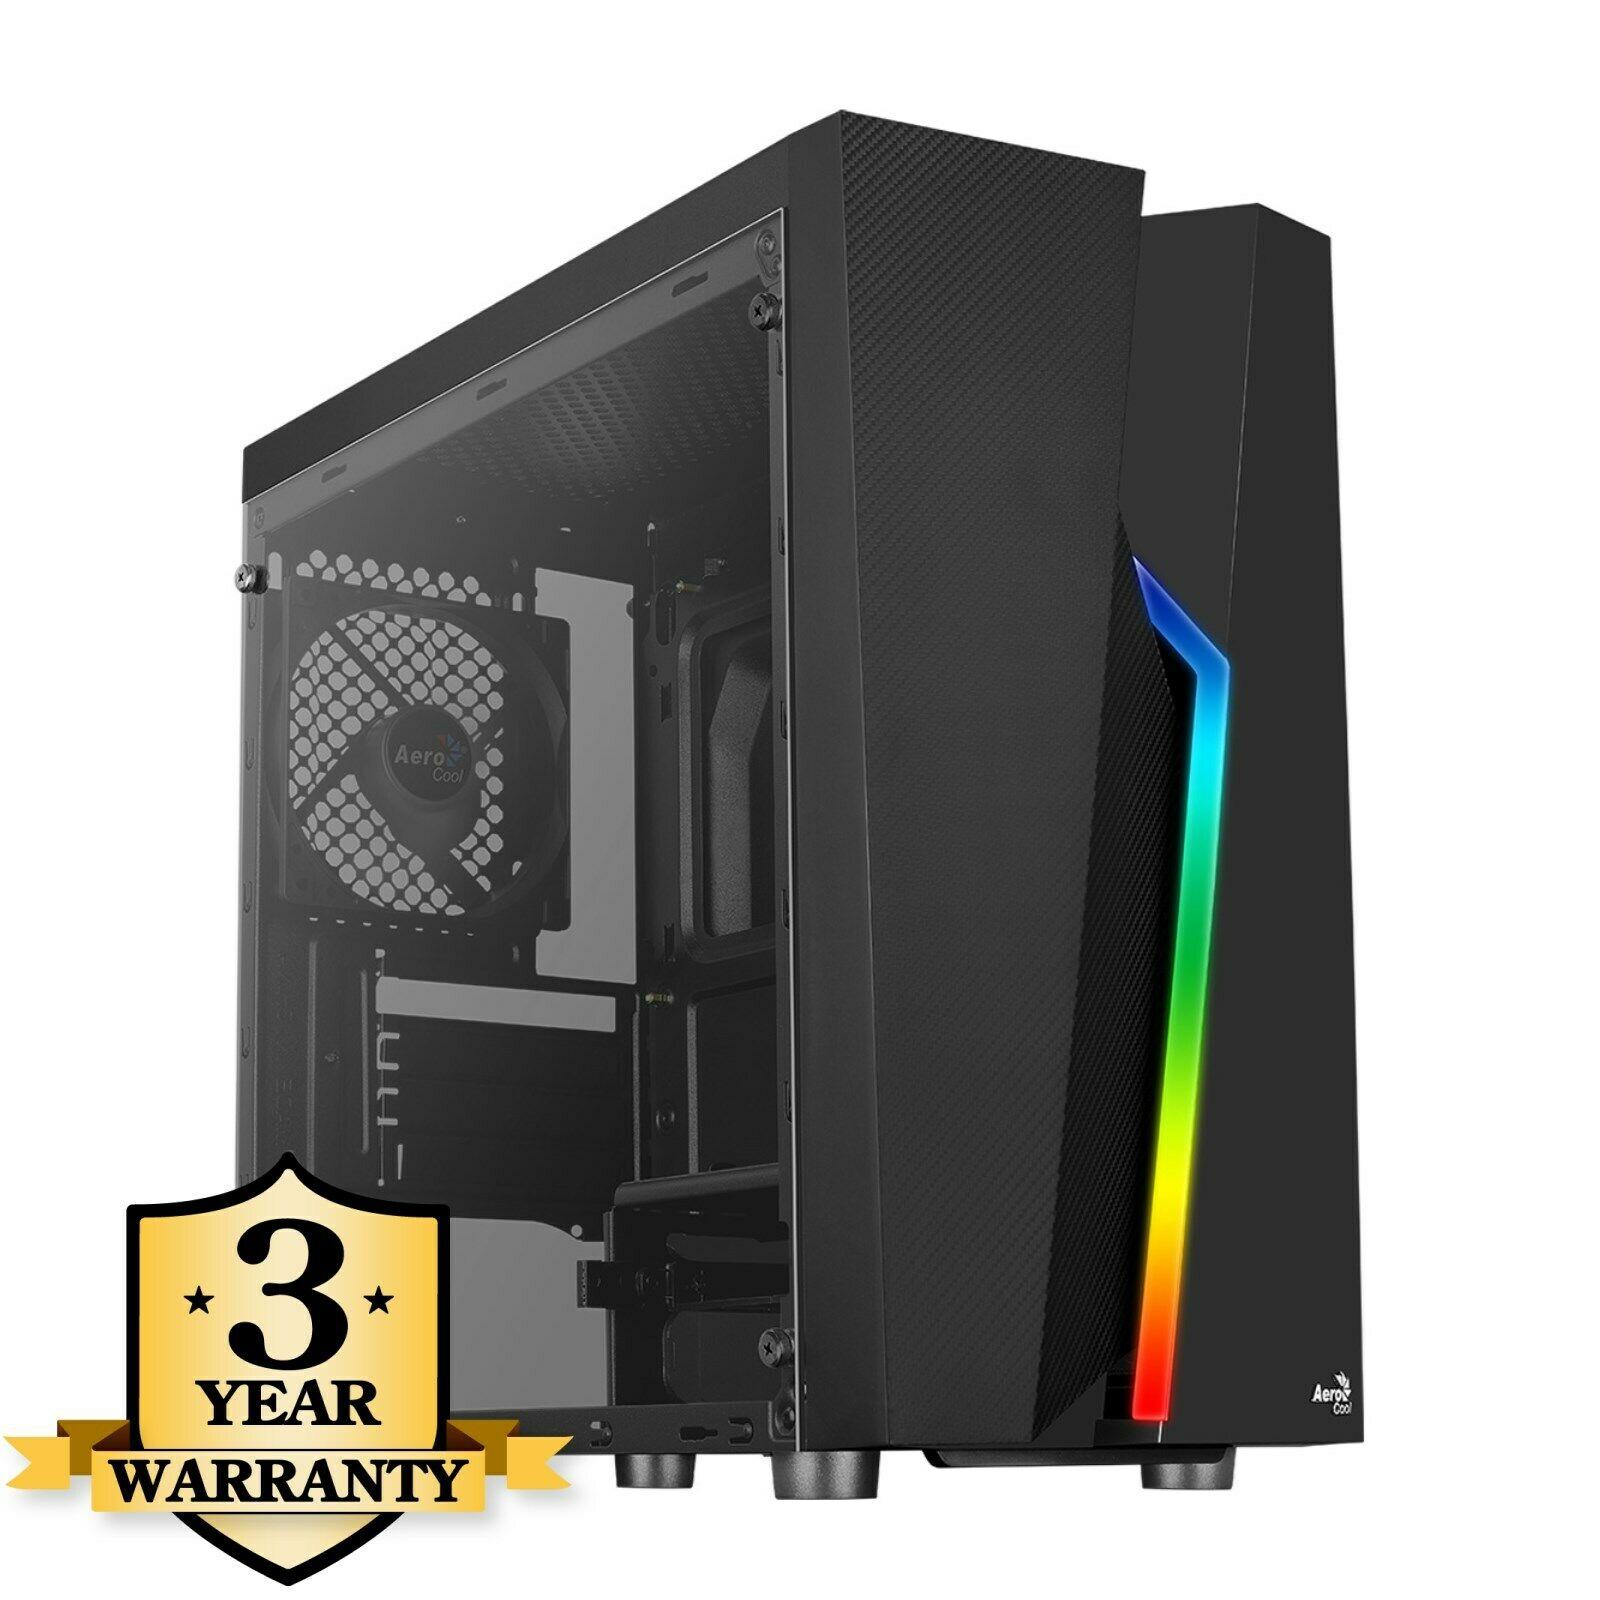 CCL Speedy 4.3GHz AMD Octa Core Ryzen 7-2700X Desktop PC - 16GB RAM, 8GB RX 590 at Ebay/CCL for 655.99